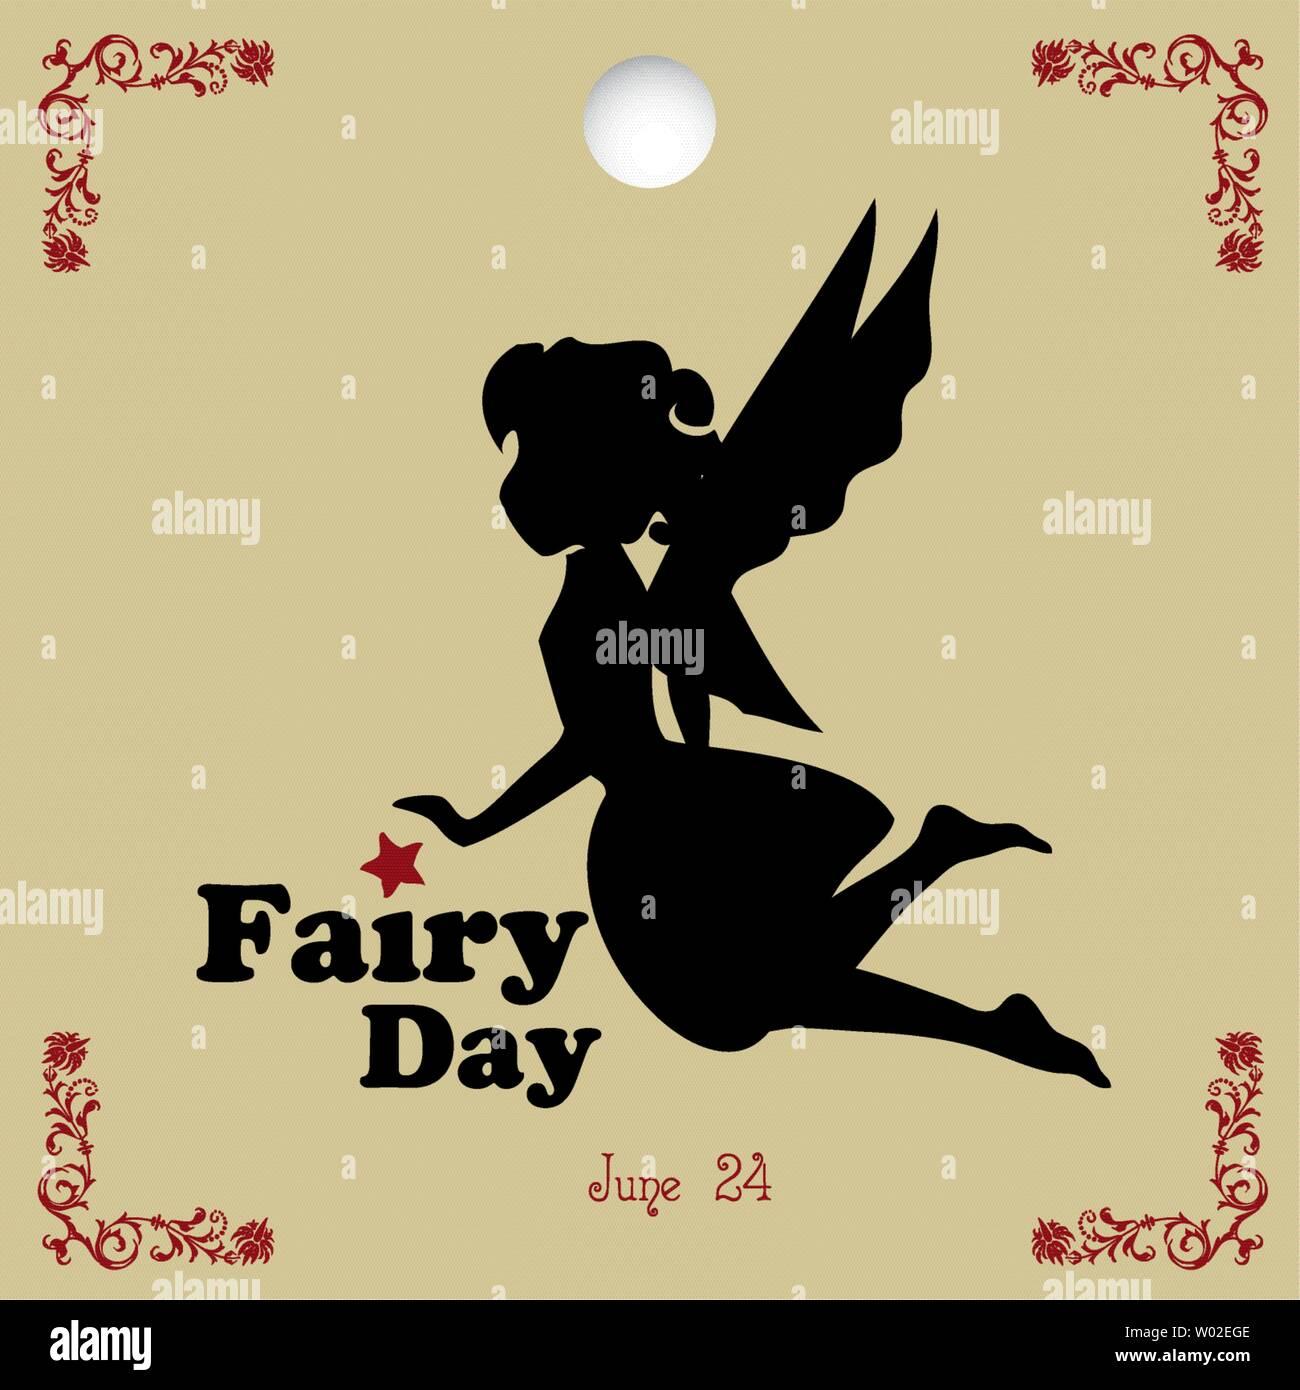 A popular day - Fairy Day. Calendar date in june - Stock Vector